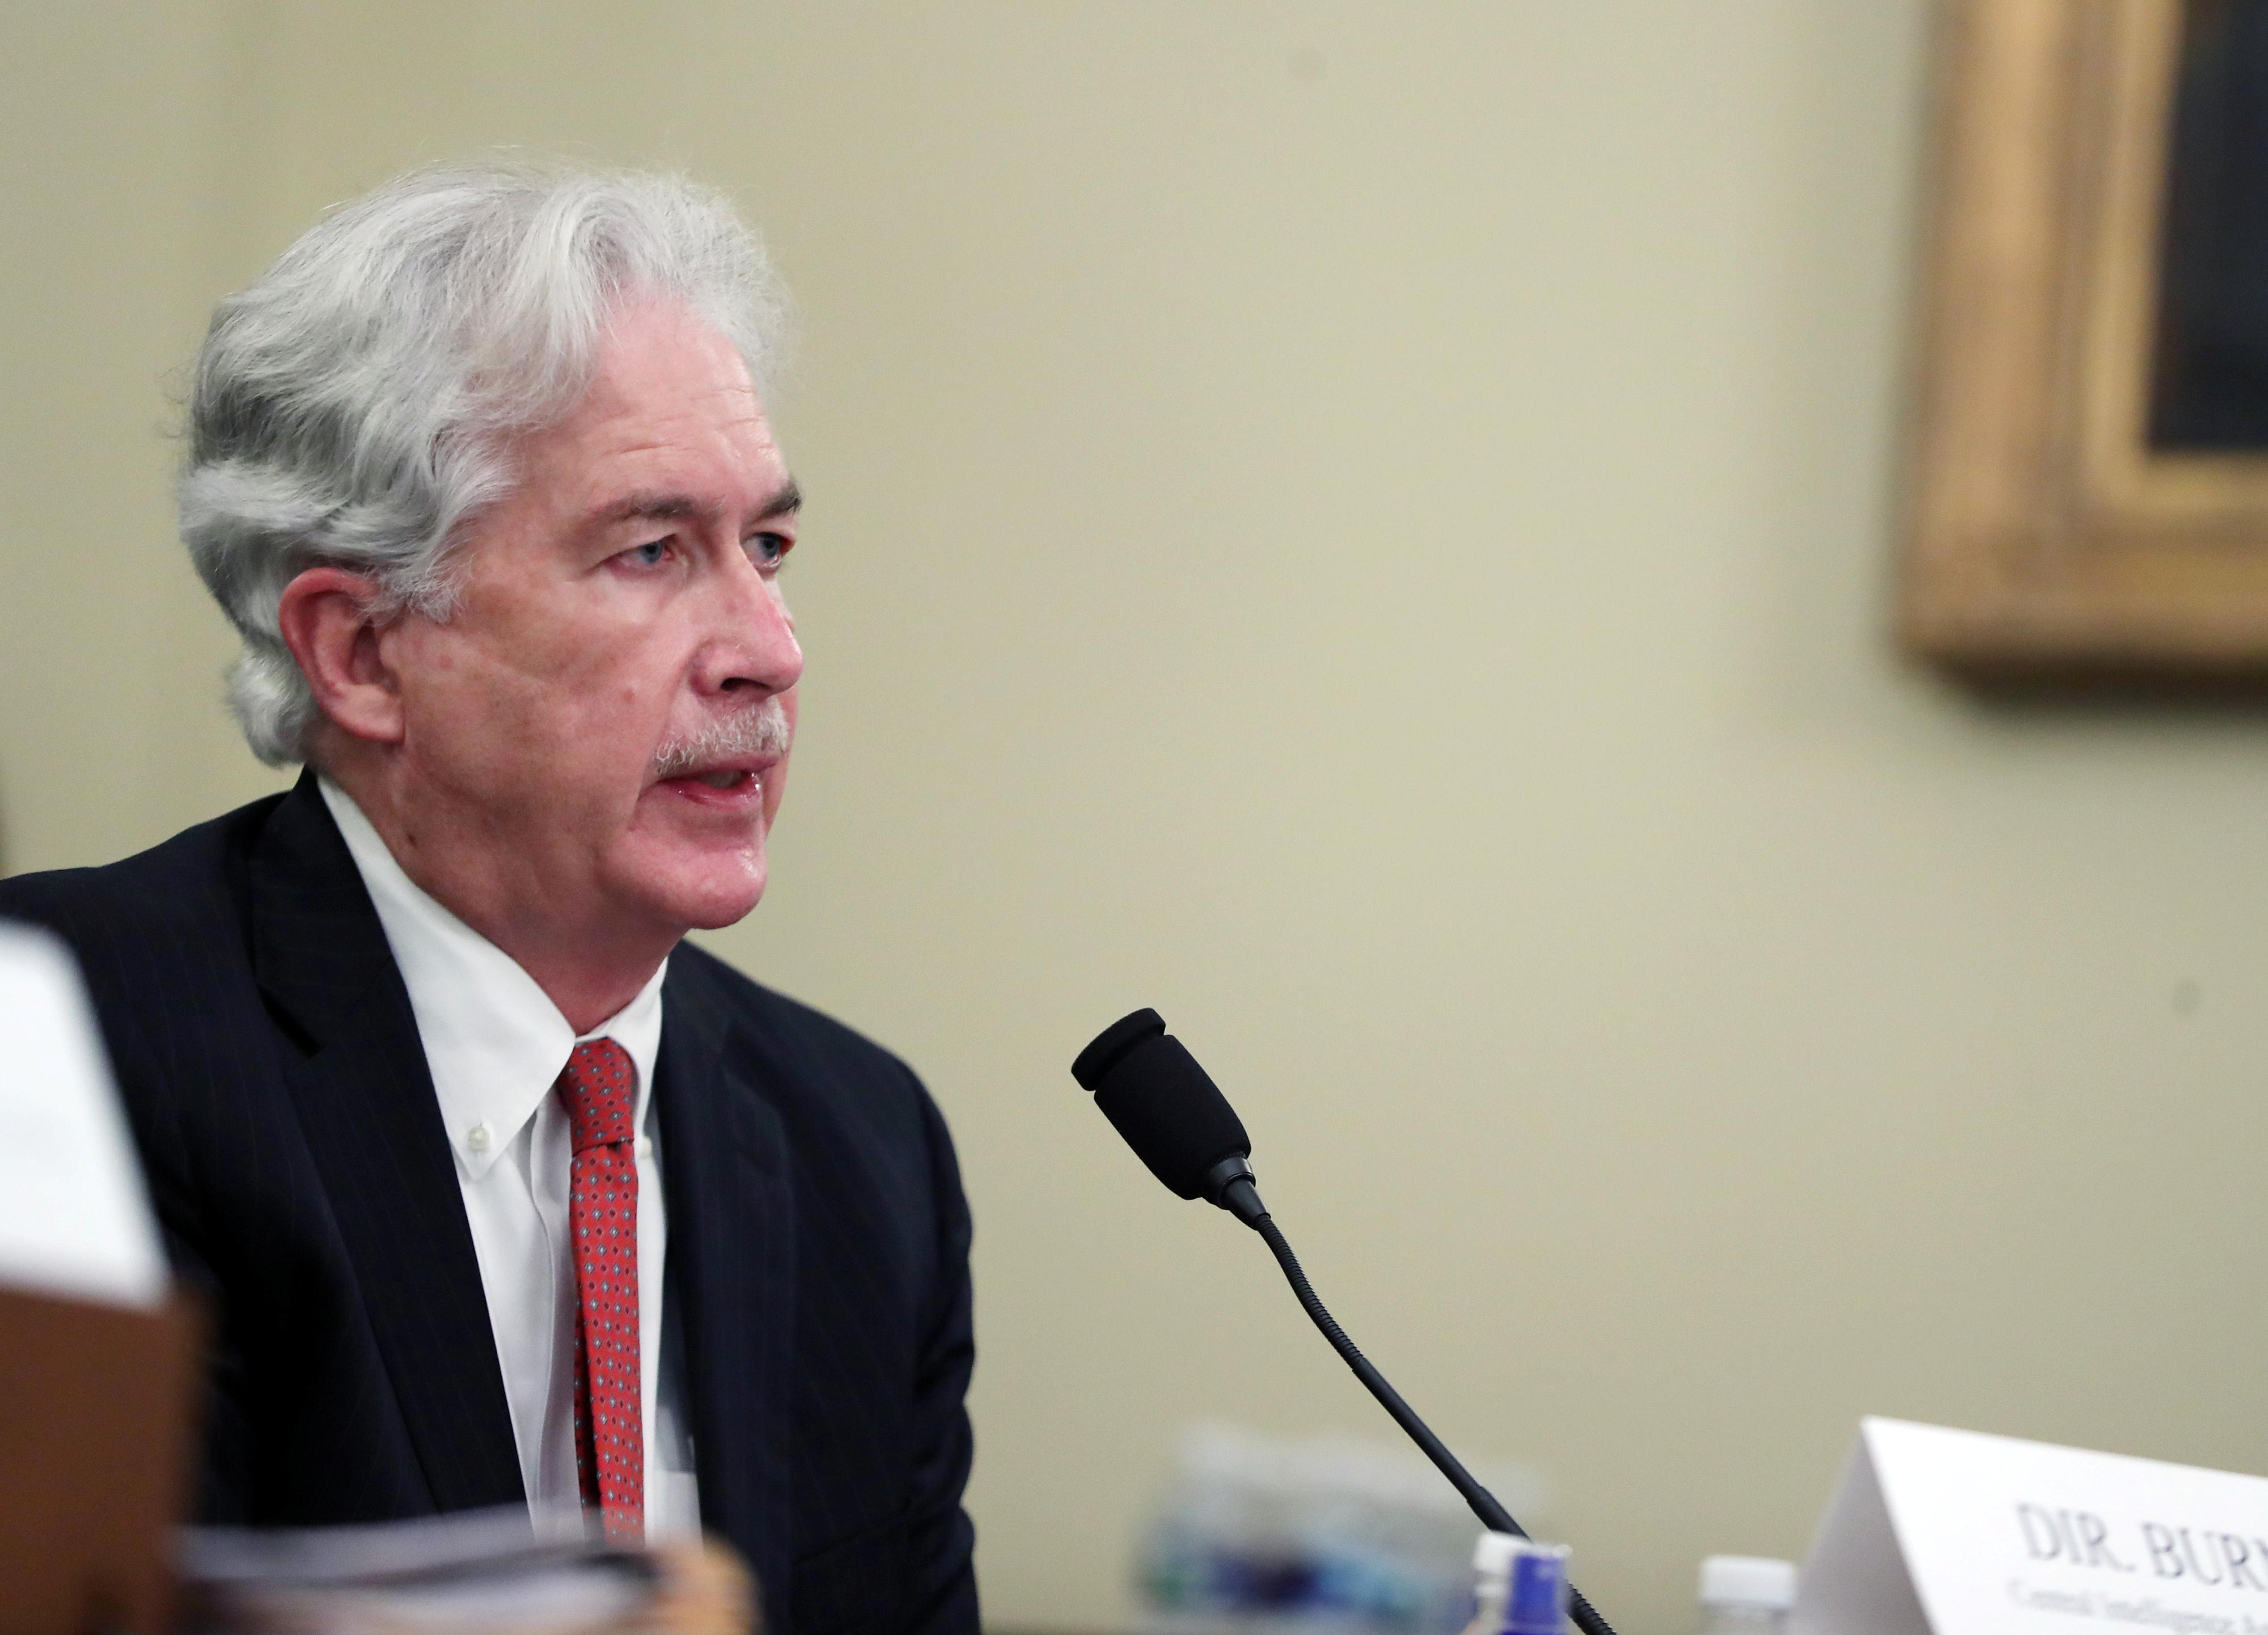 CIA Director William Burns speaks during a House Intelligence Committee hearing on worldwide threats, in Washington, D.C., U.S., April 15, 2021. Tasos Katopodis/Pool via REUTERS